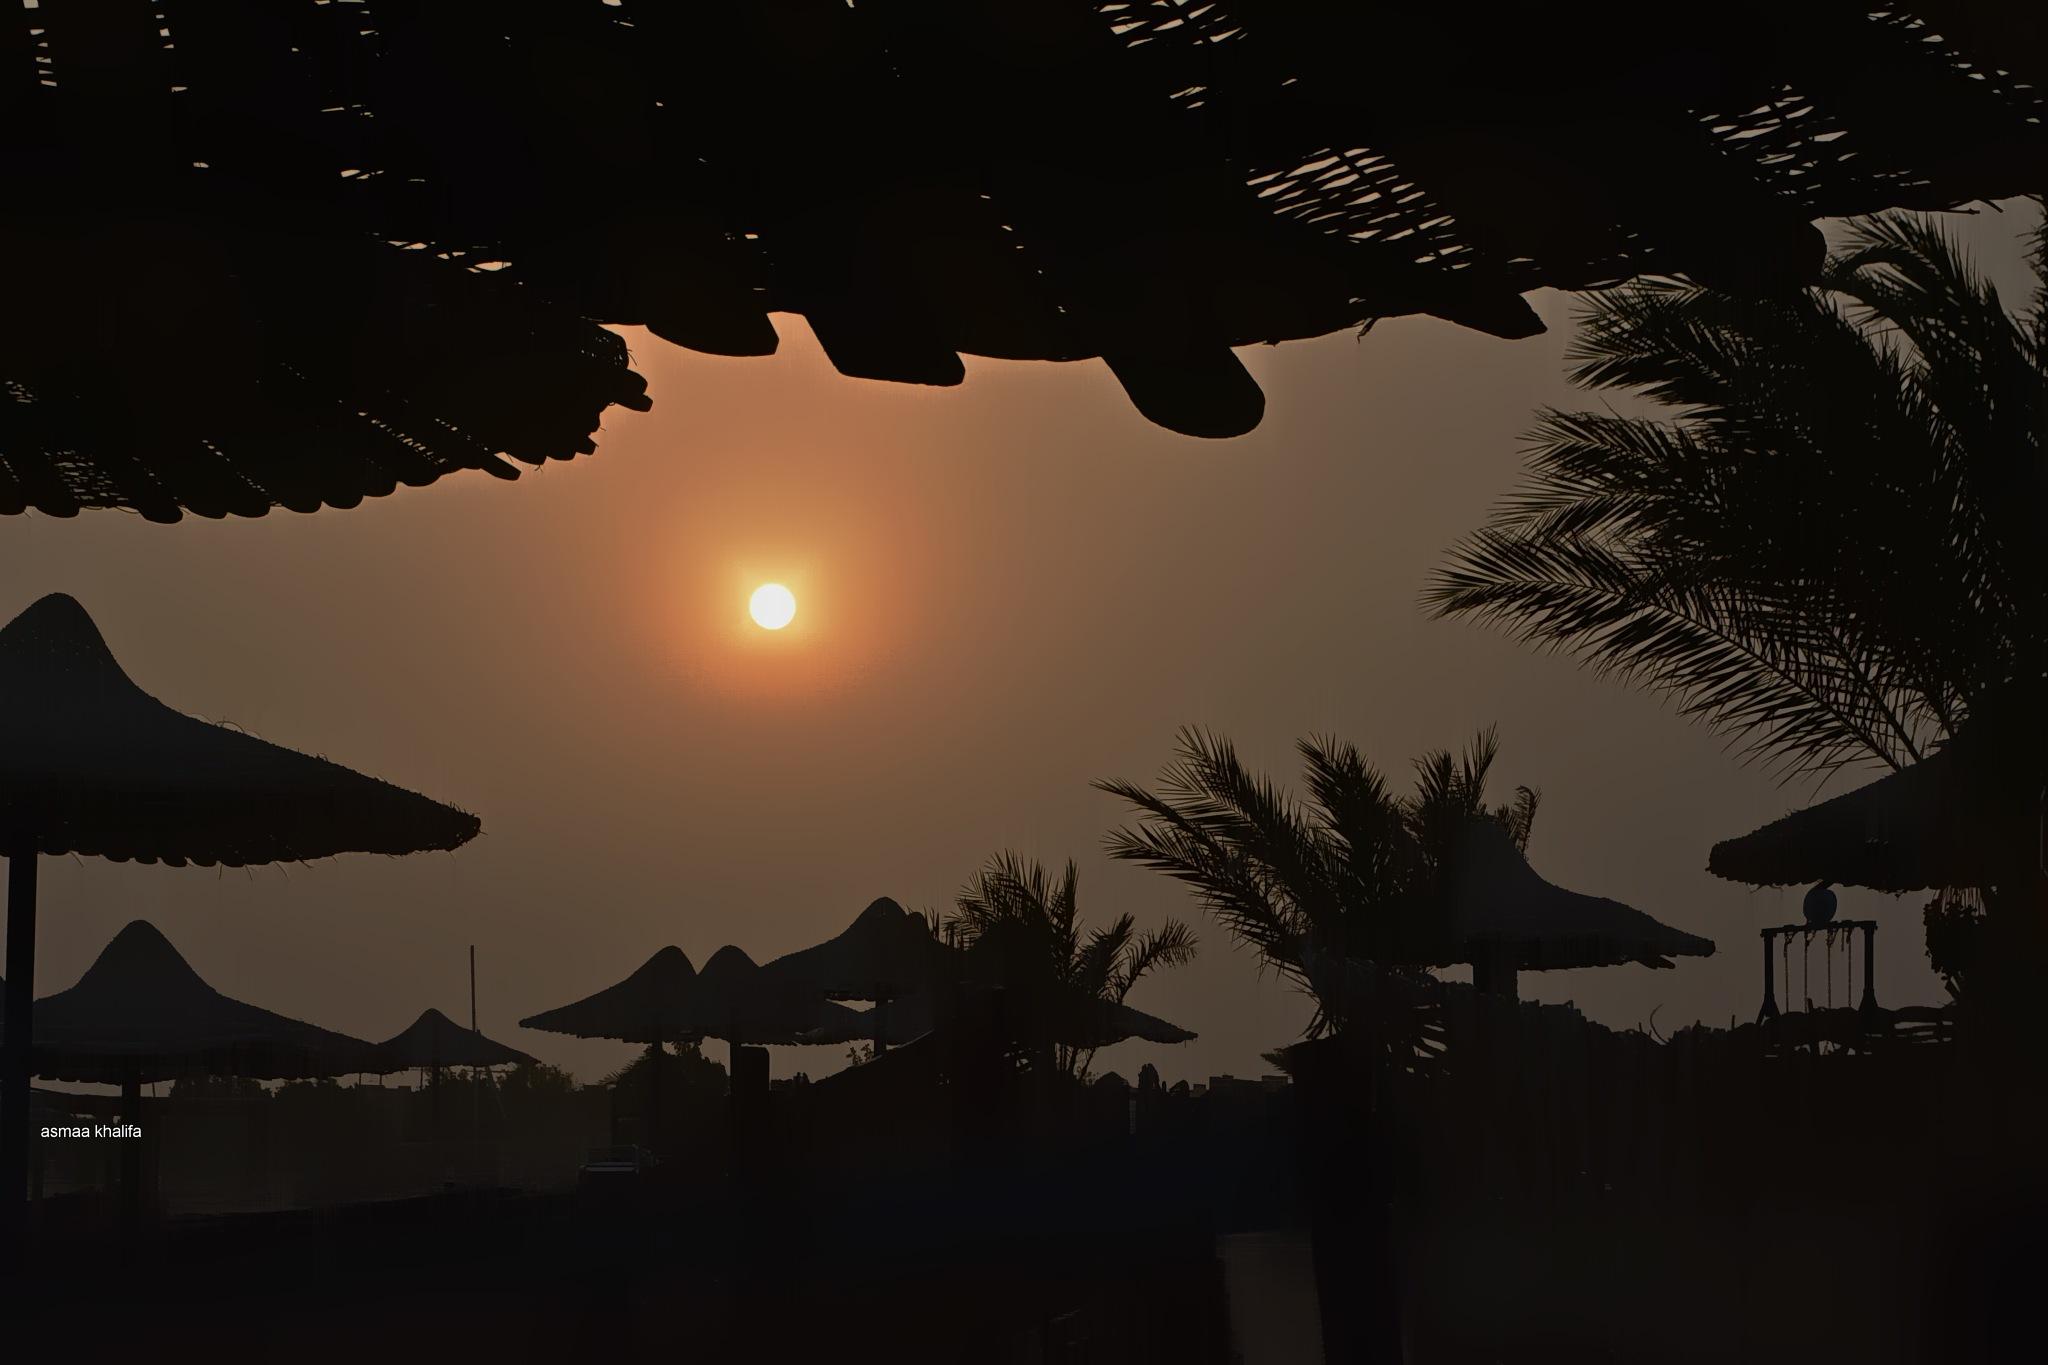 Sunset by asmaa.khalifa.7